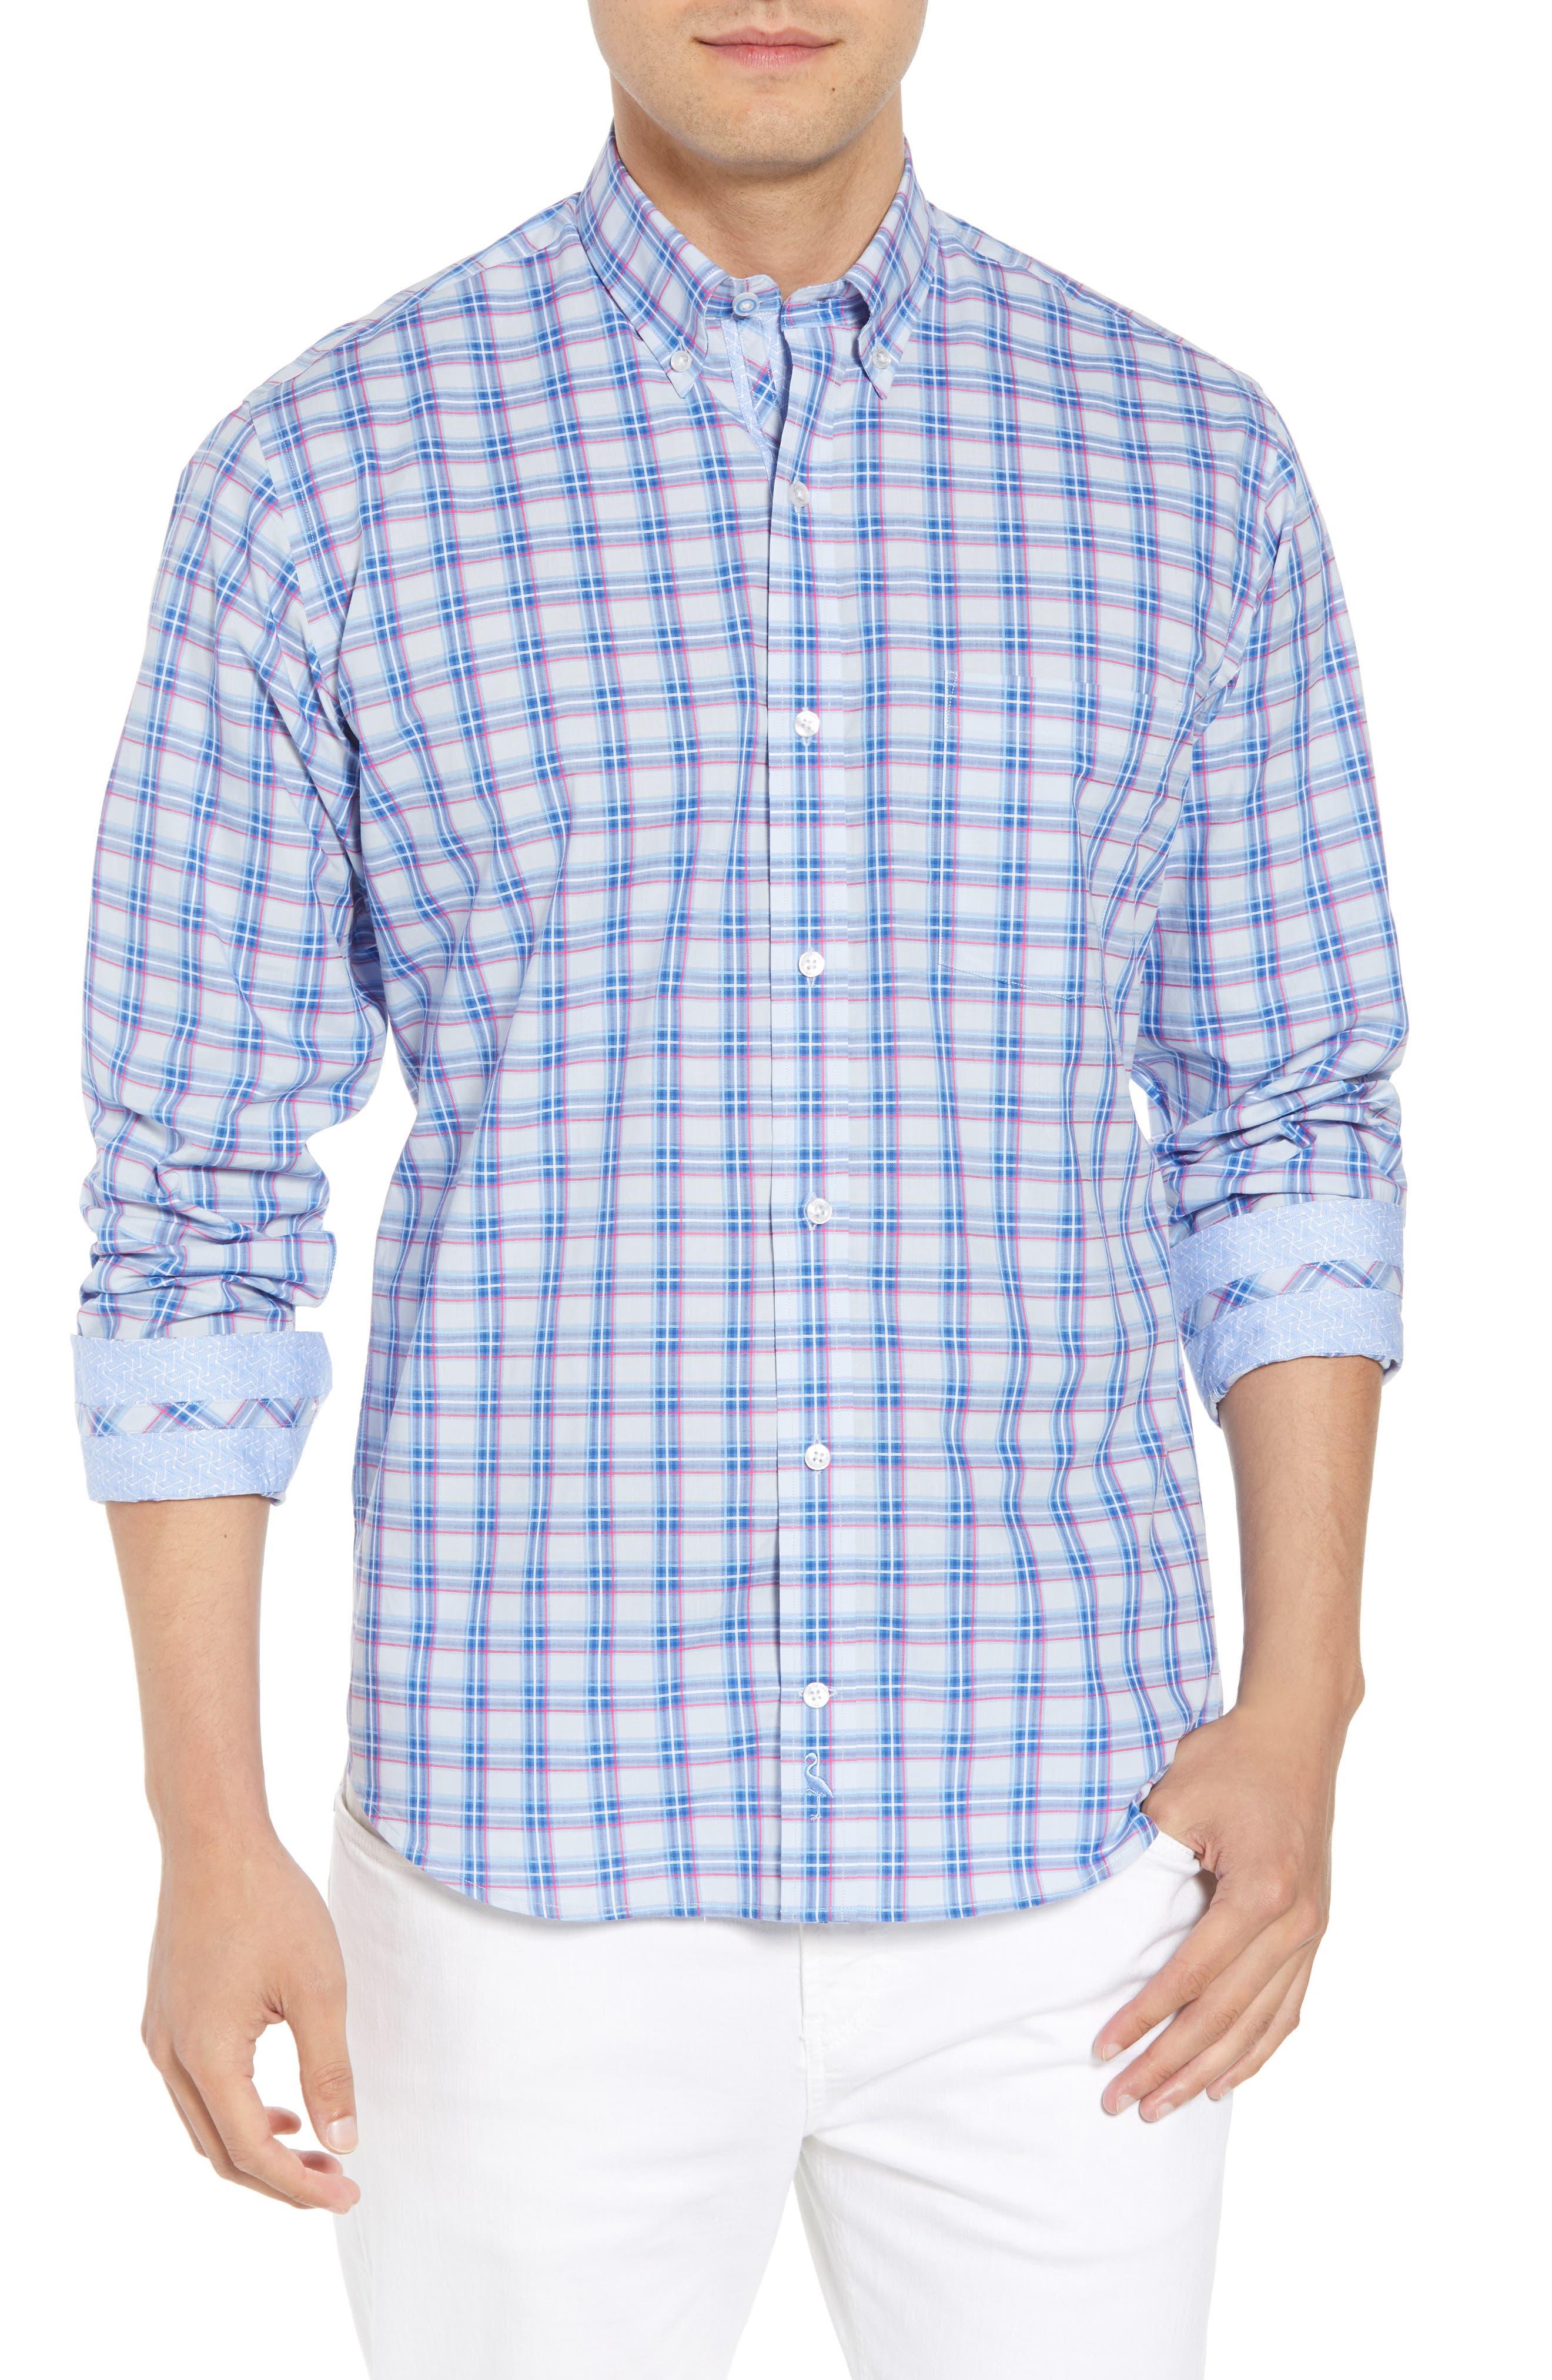 Alvaro Regular Fit Plaid Sport Shirt,                             Main thumbnail 1, color,                             450